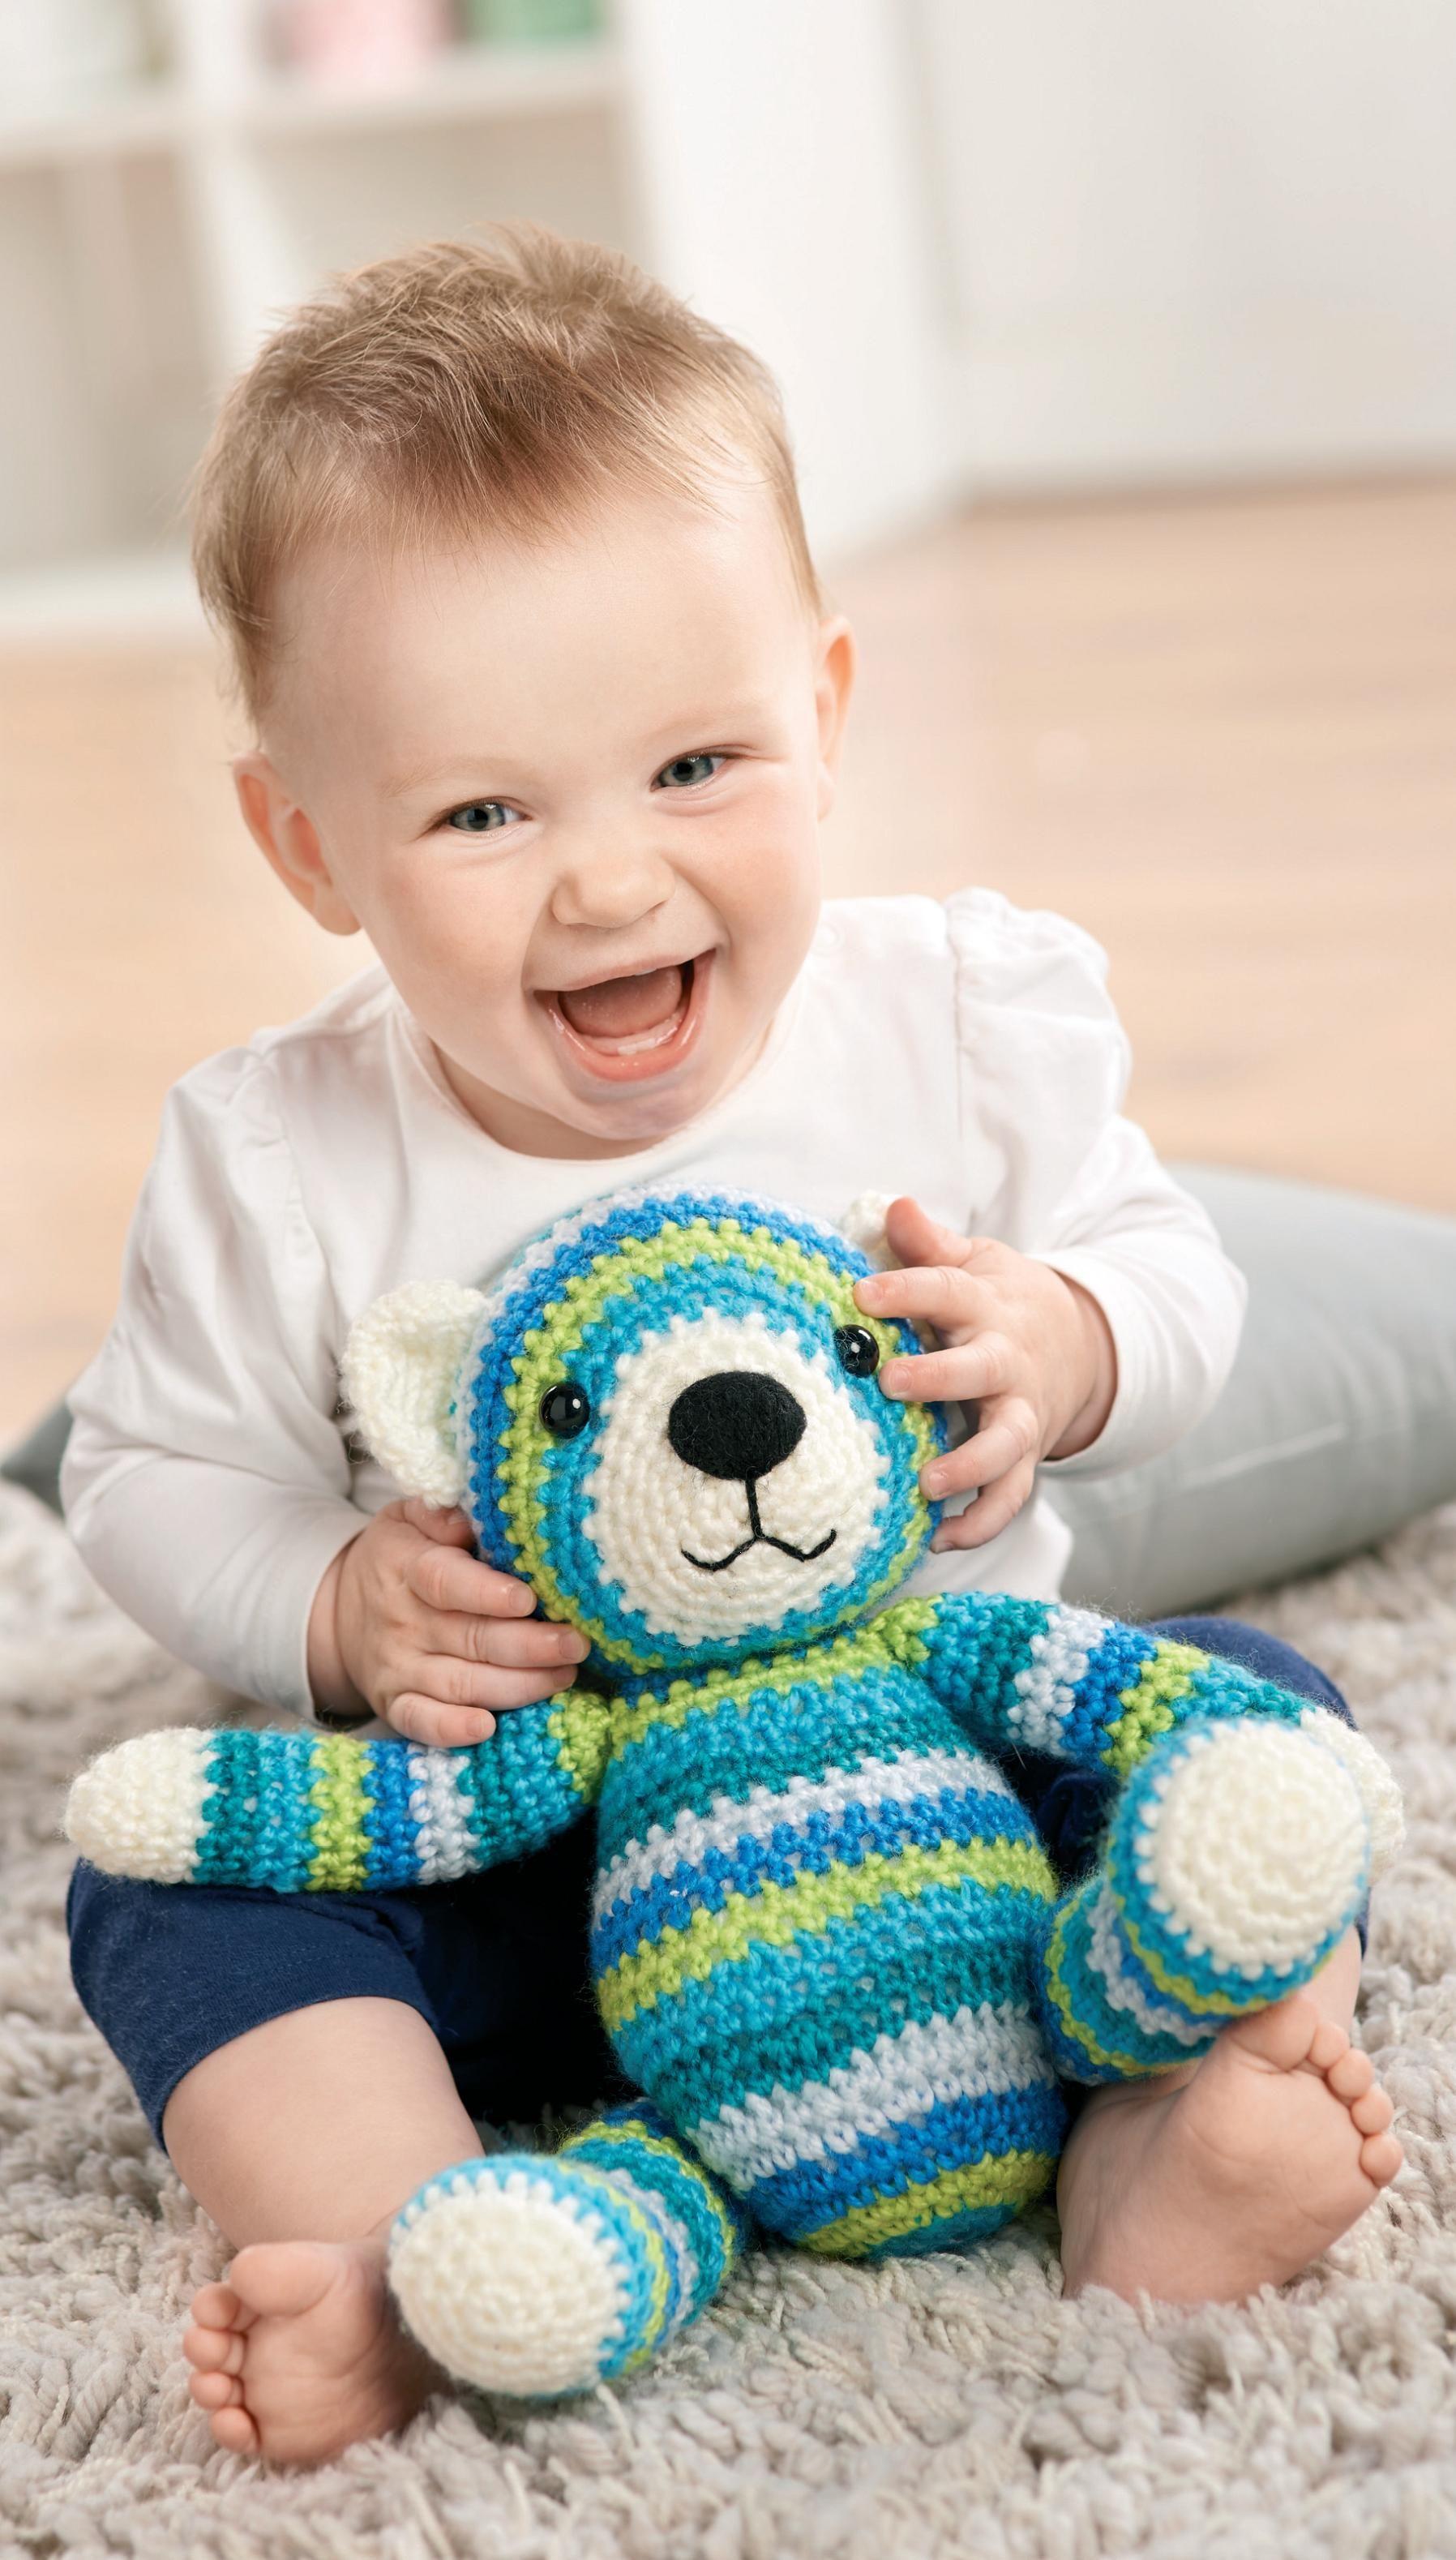 Classic Crochet Teddy Bear Free Pattern | amigurami | Pinterest ...